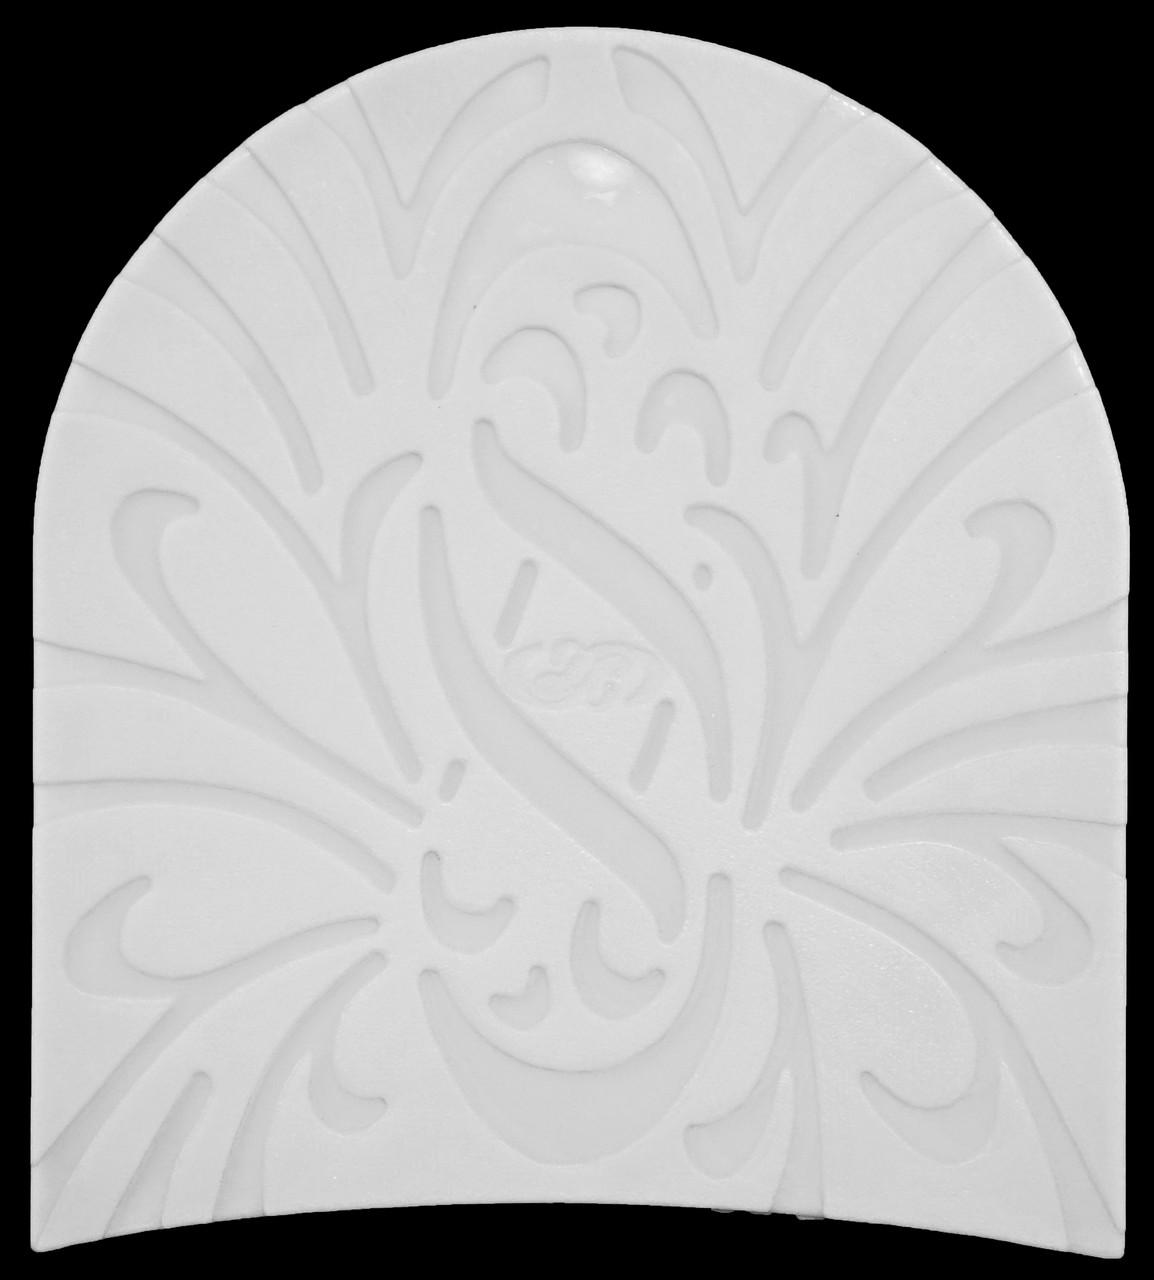 Набійка поліуретанова № 0 8В (Латвія), бел.